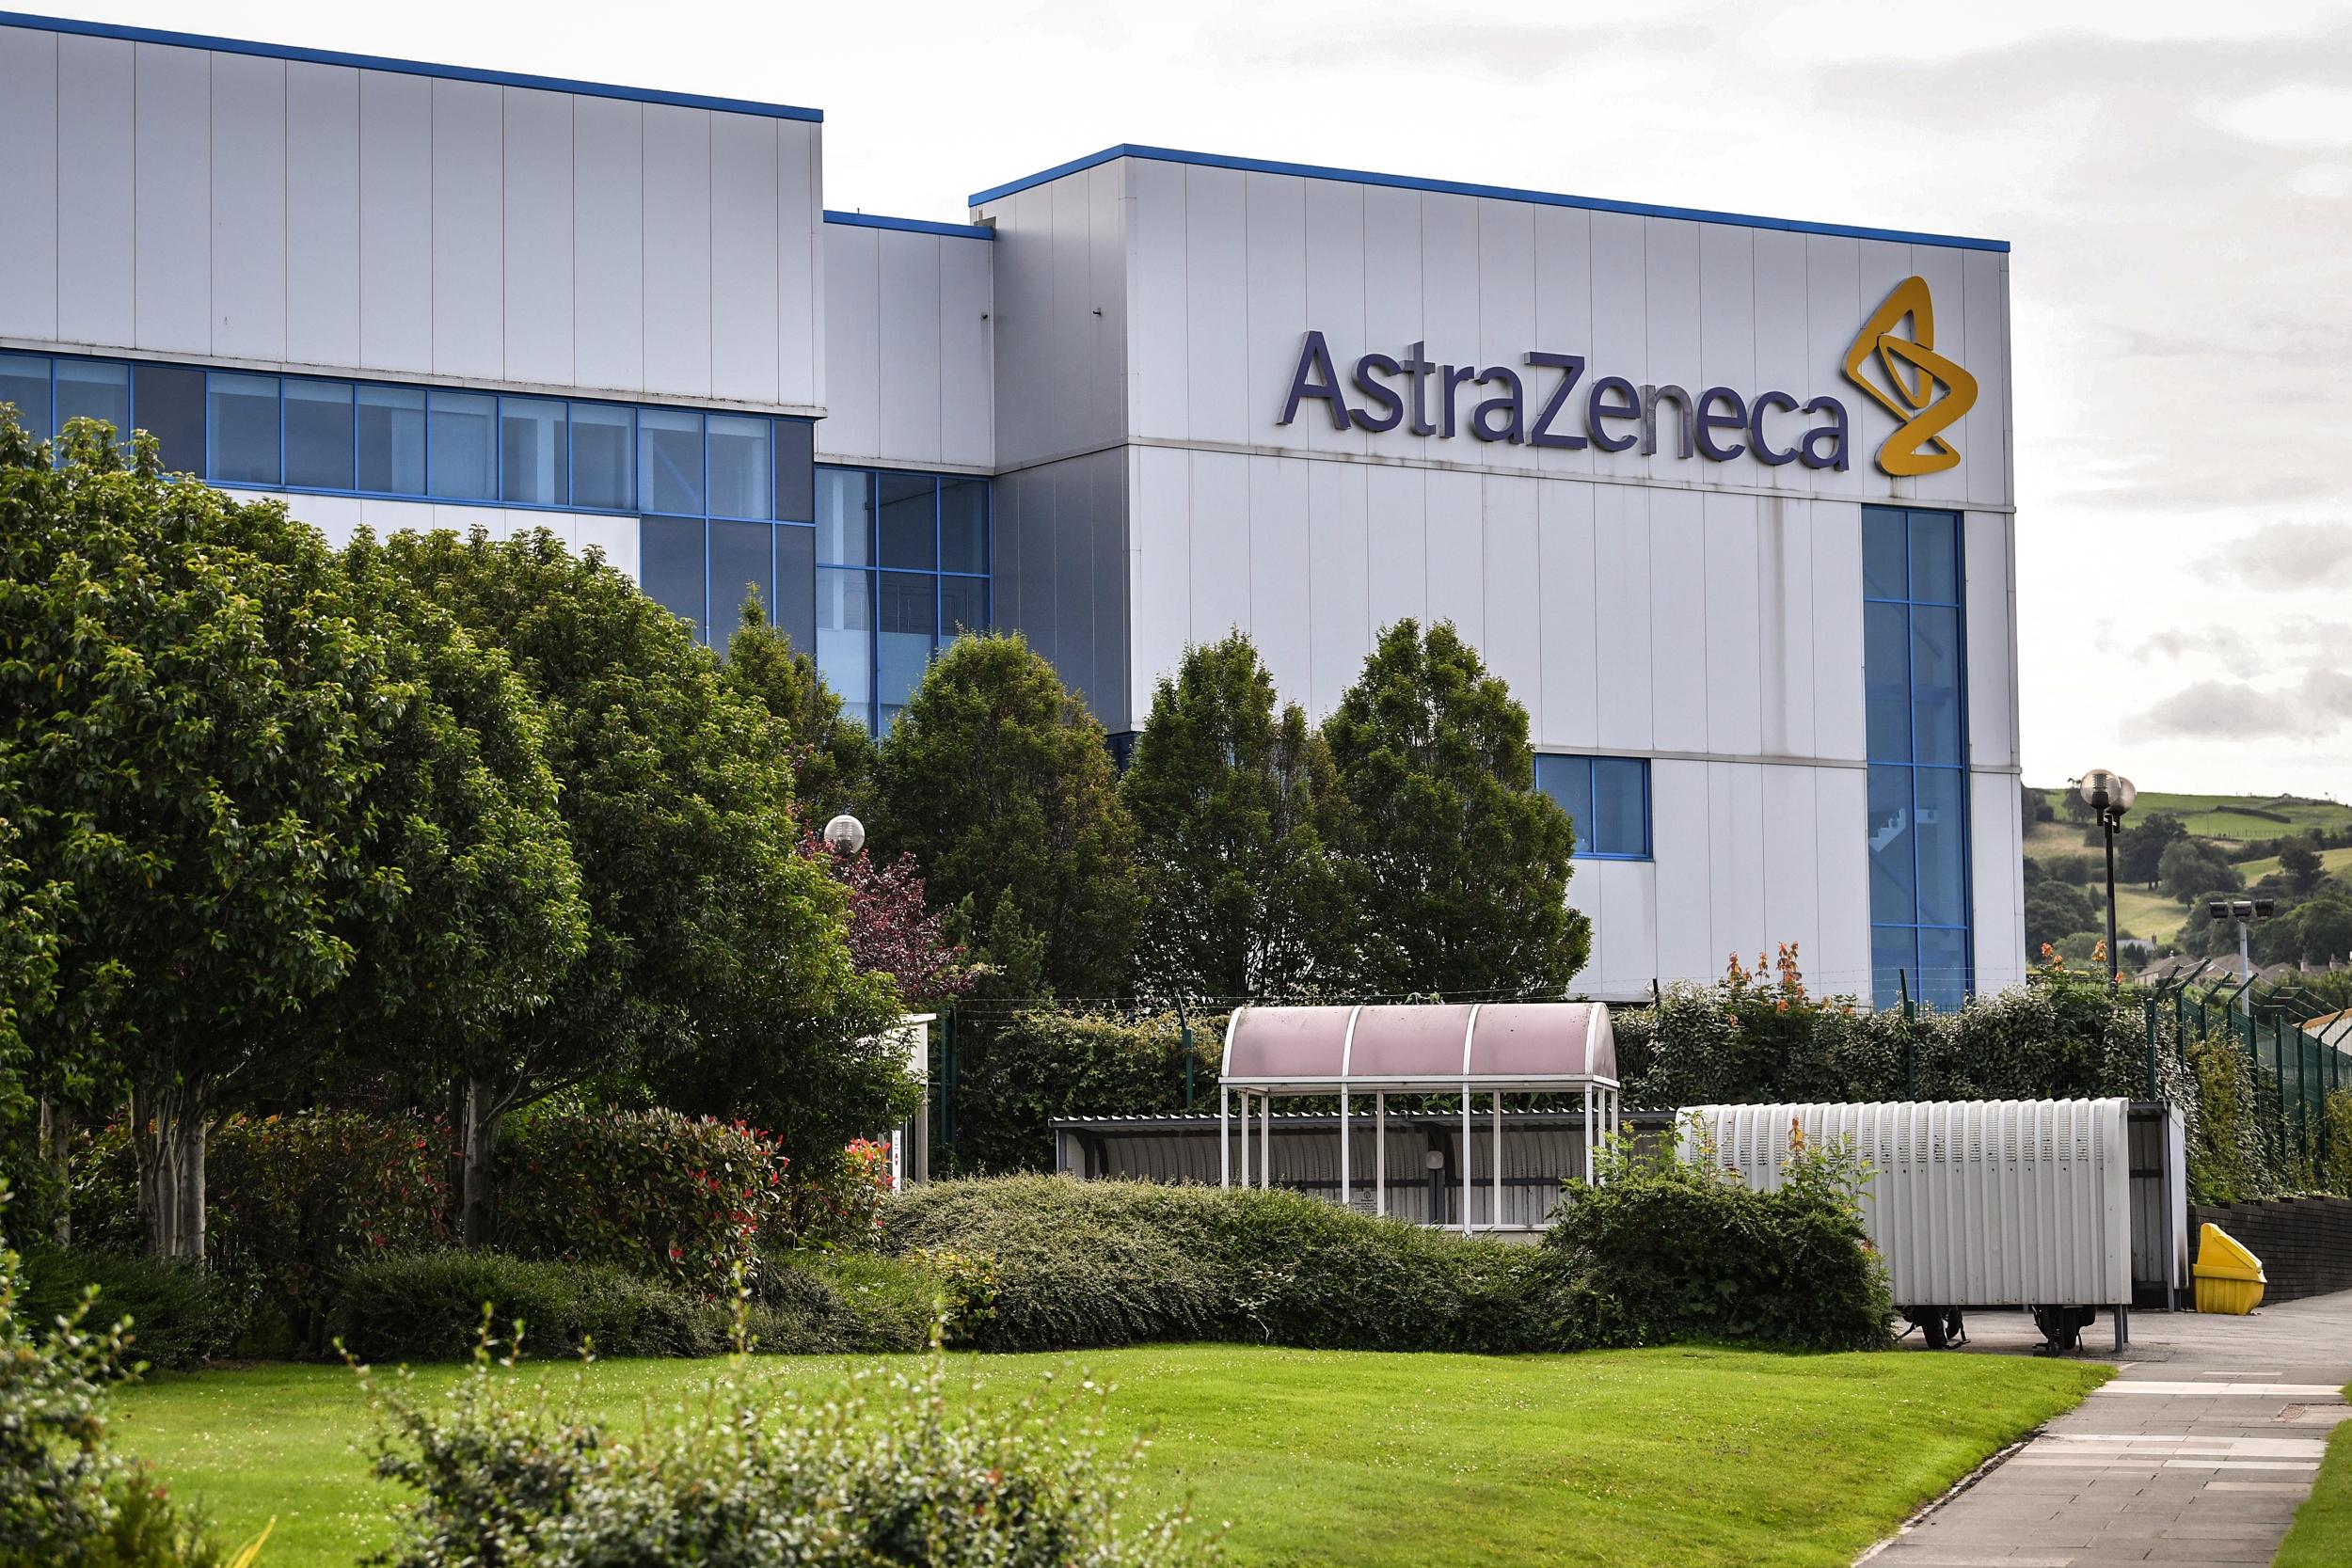 AstraZeneca asks FDA to authorize Covid antibody treatment to prevent illness